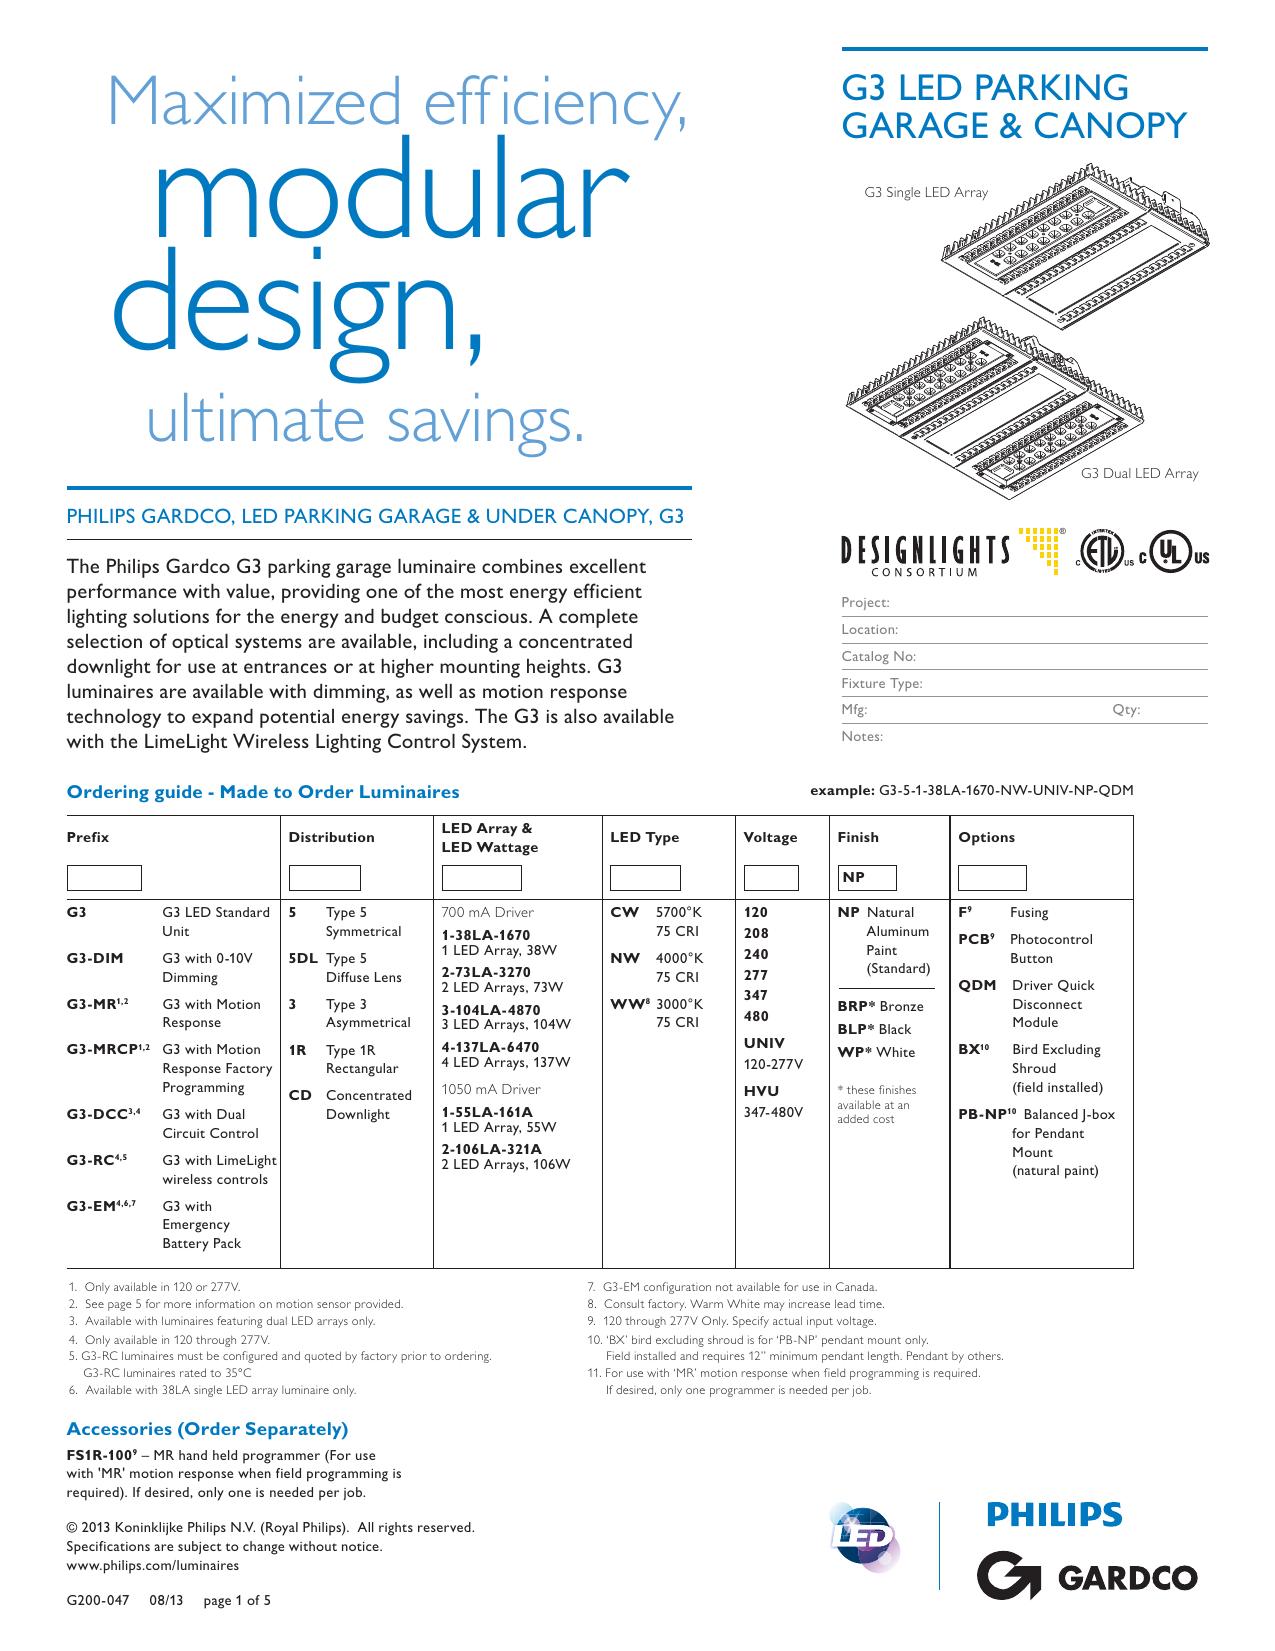 philips gardco g3 parking garage spec sheet rh studylib net Touch Lamp Sensor Wiring Diagram Touch Lamp Sensor Wiring Diagram